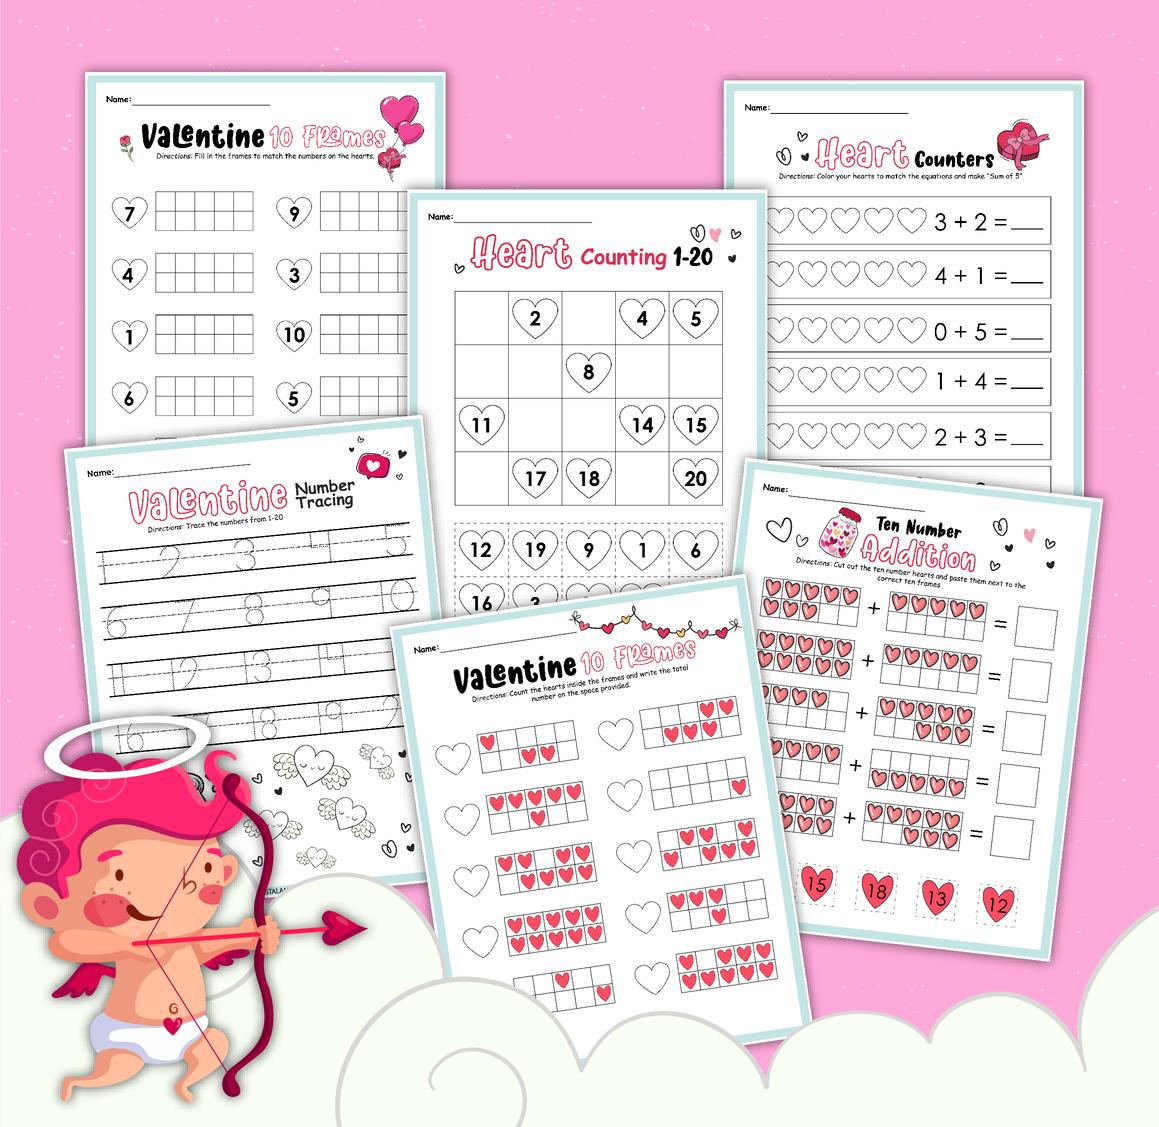 hight resolution of Valentine Themed Math Worksheet for Kindergarten